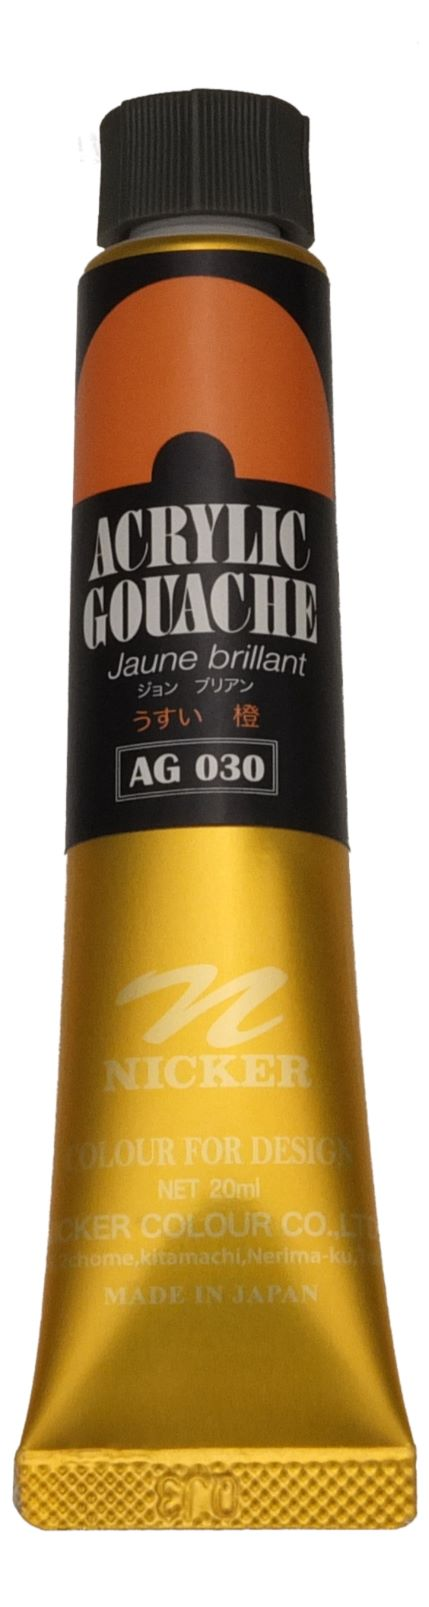 ACRYLIC GOUACHE 20ml AG030 JAUNE BRILLANT